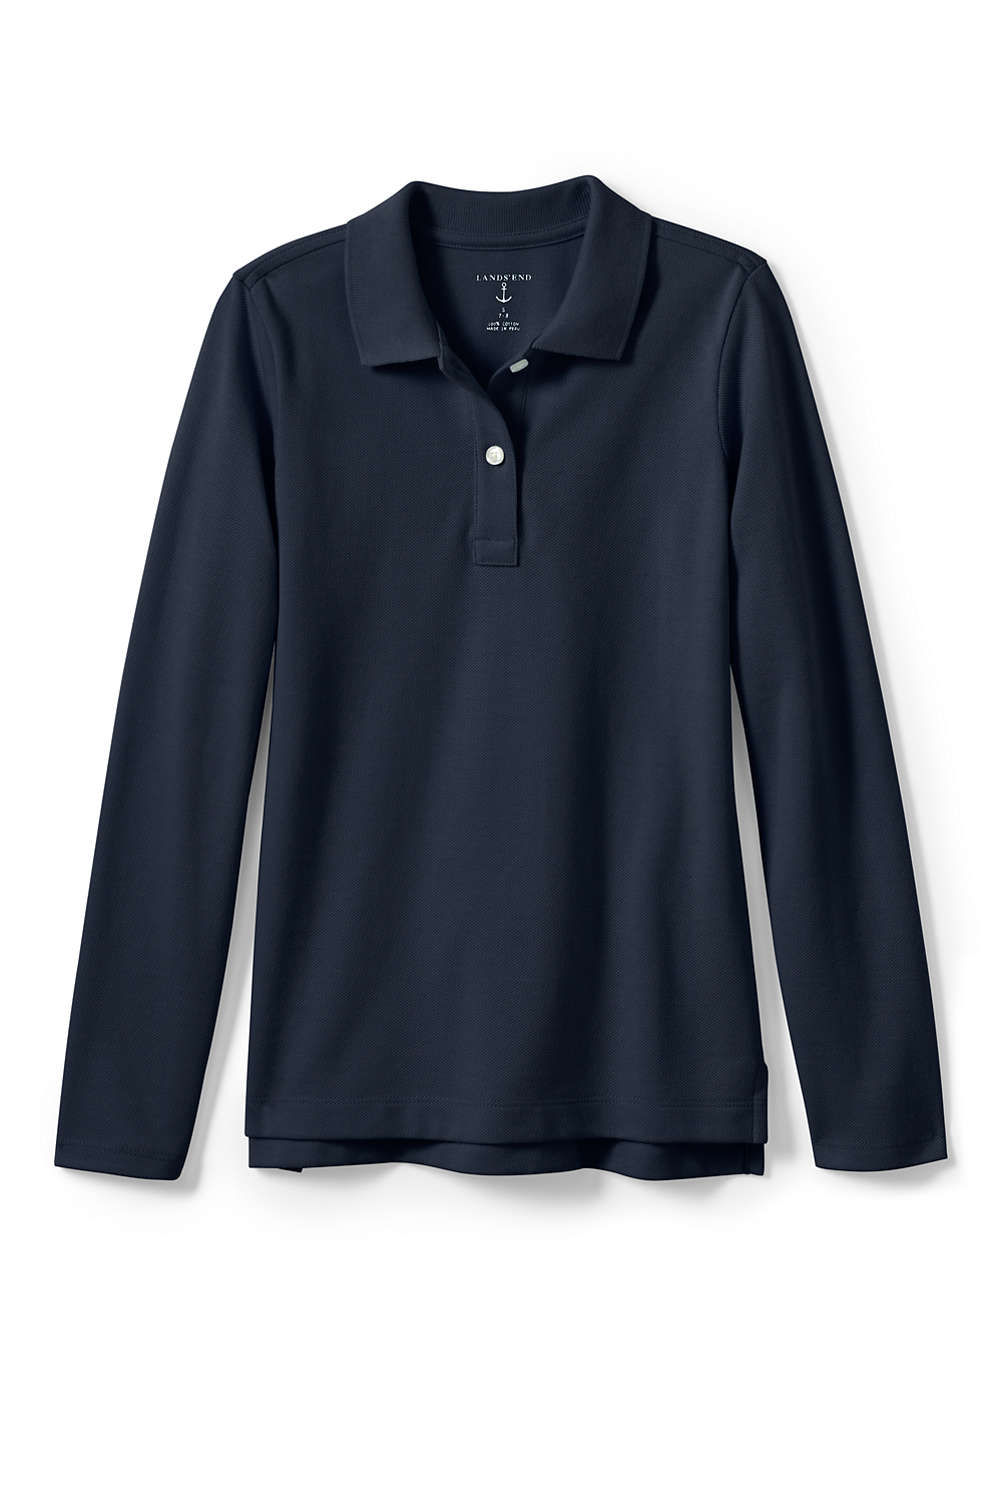 9dcf3d1d6 School Uniform Girls Fem Fit Long Sleeve Mesh Polo from Lands' End